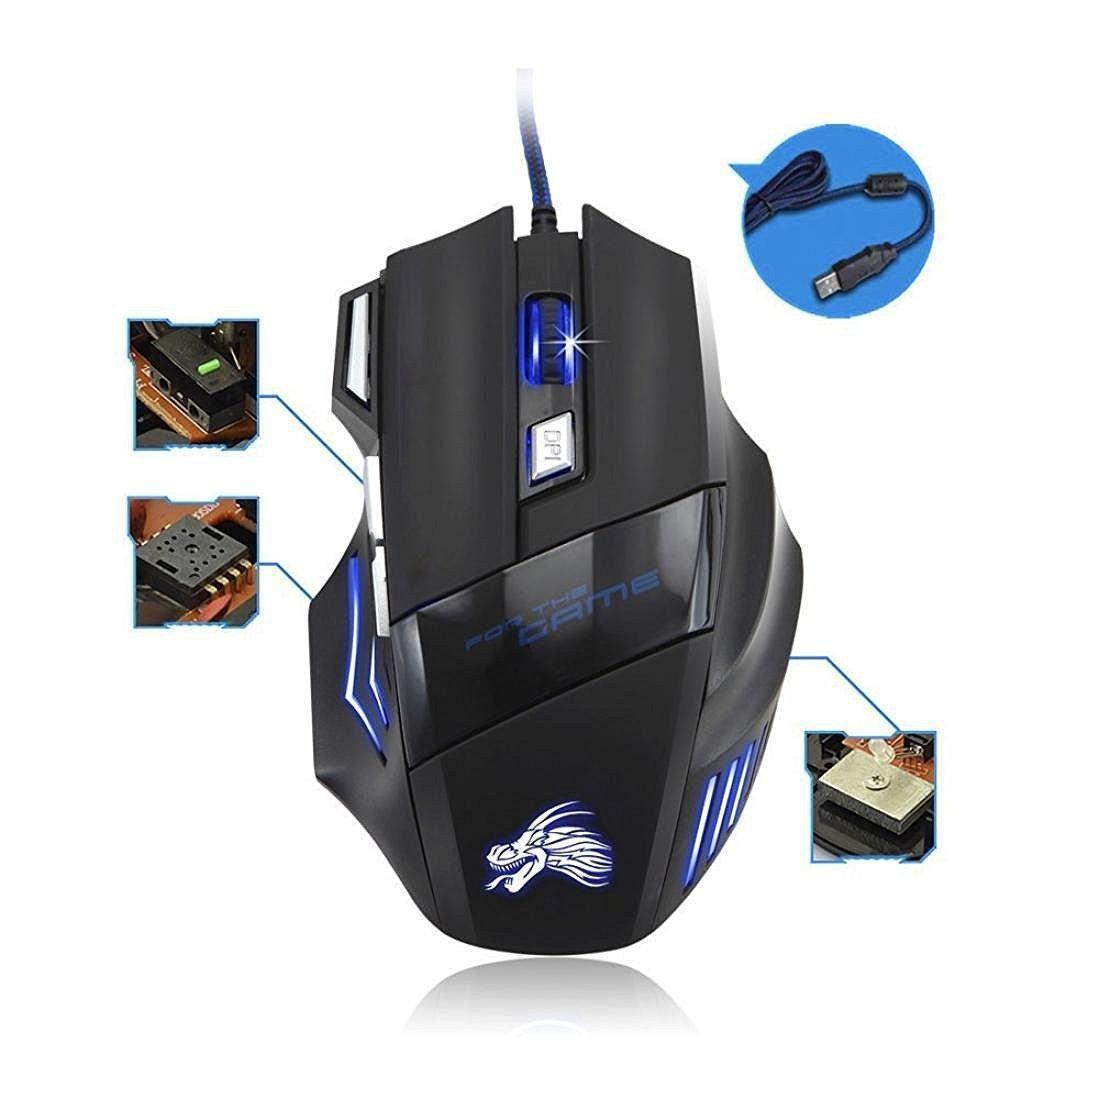 5500 DPI 7 Botão LED USB Óptico Wired Gaming Mouse Ratos para pc laptop